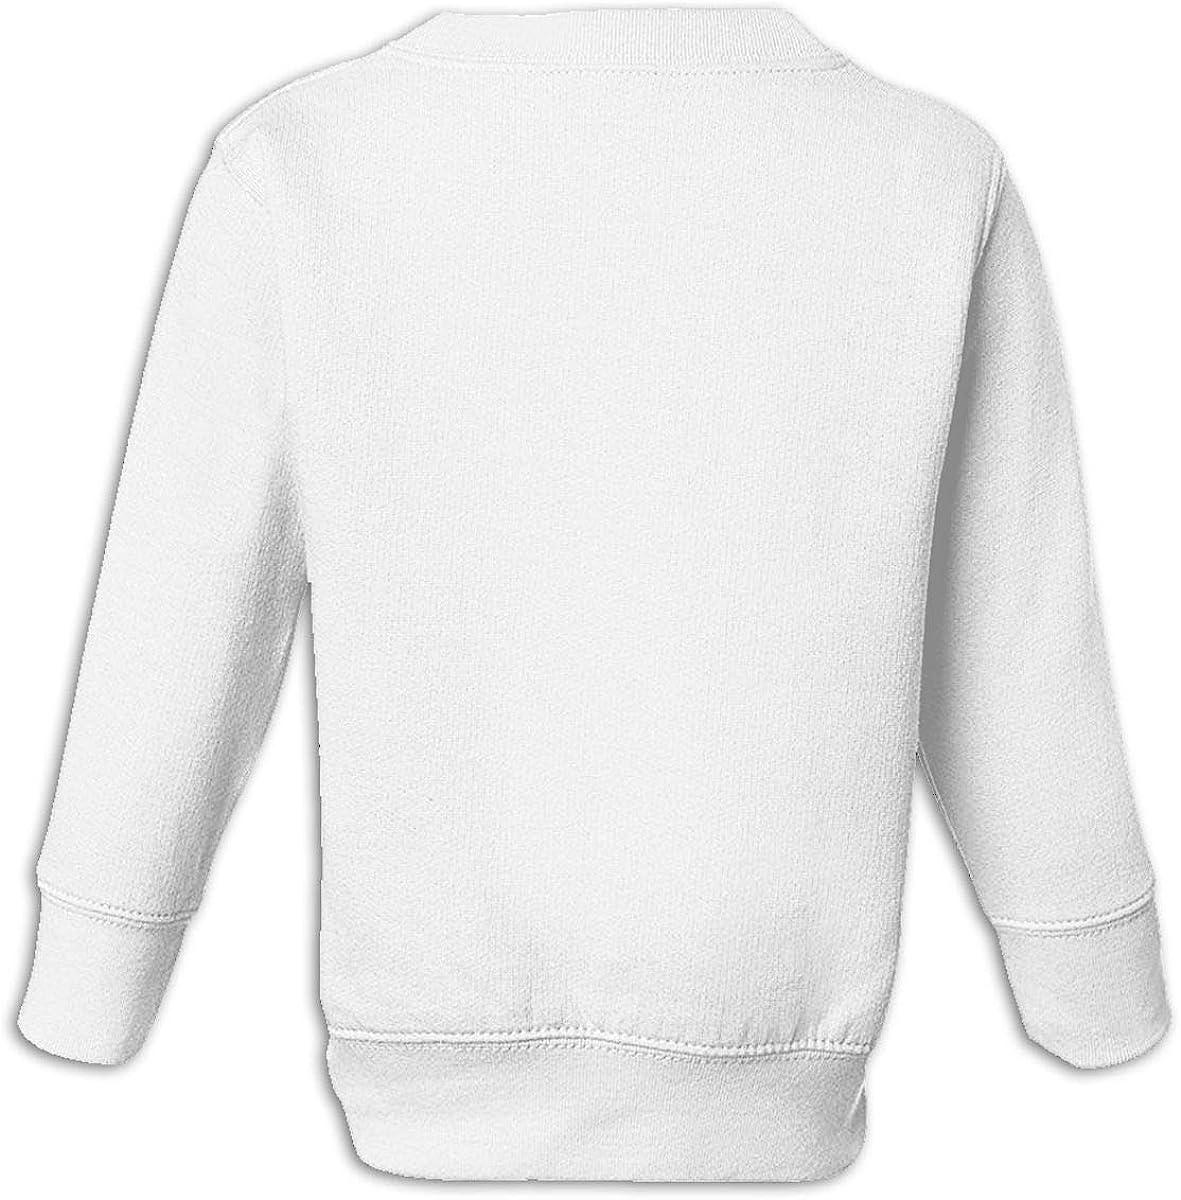 Fleece Pull Over Sweatshirt for Boys Girls Kids Youth Pit Bull Painting Unisex Toddler Hoodies